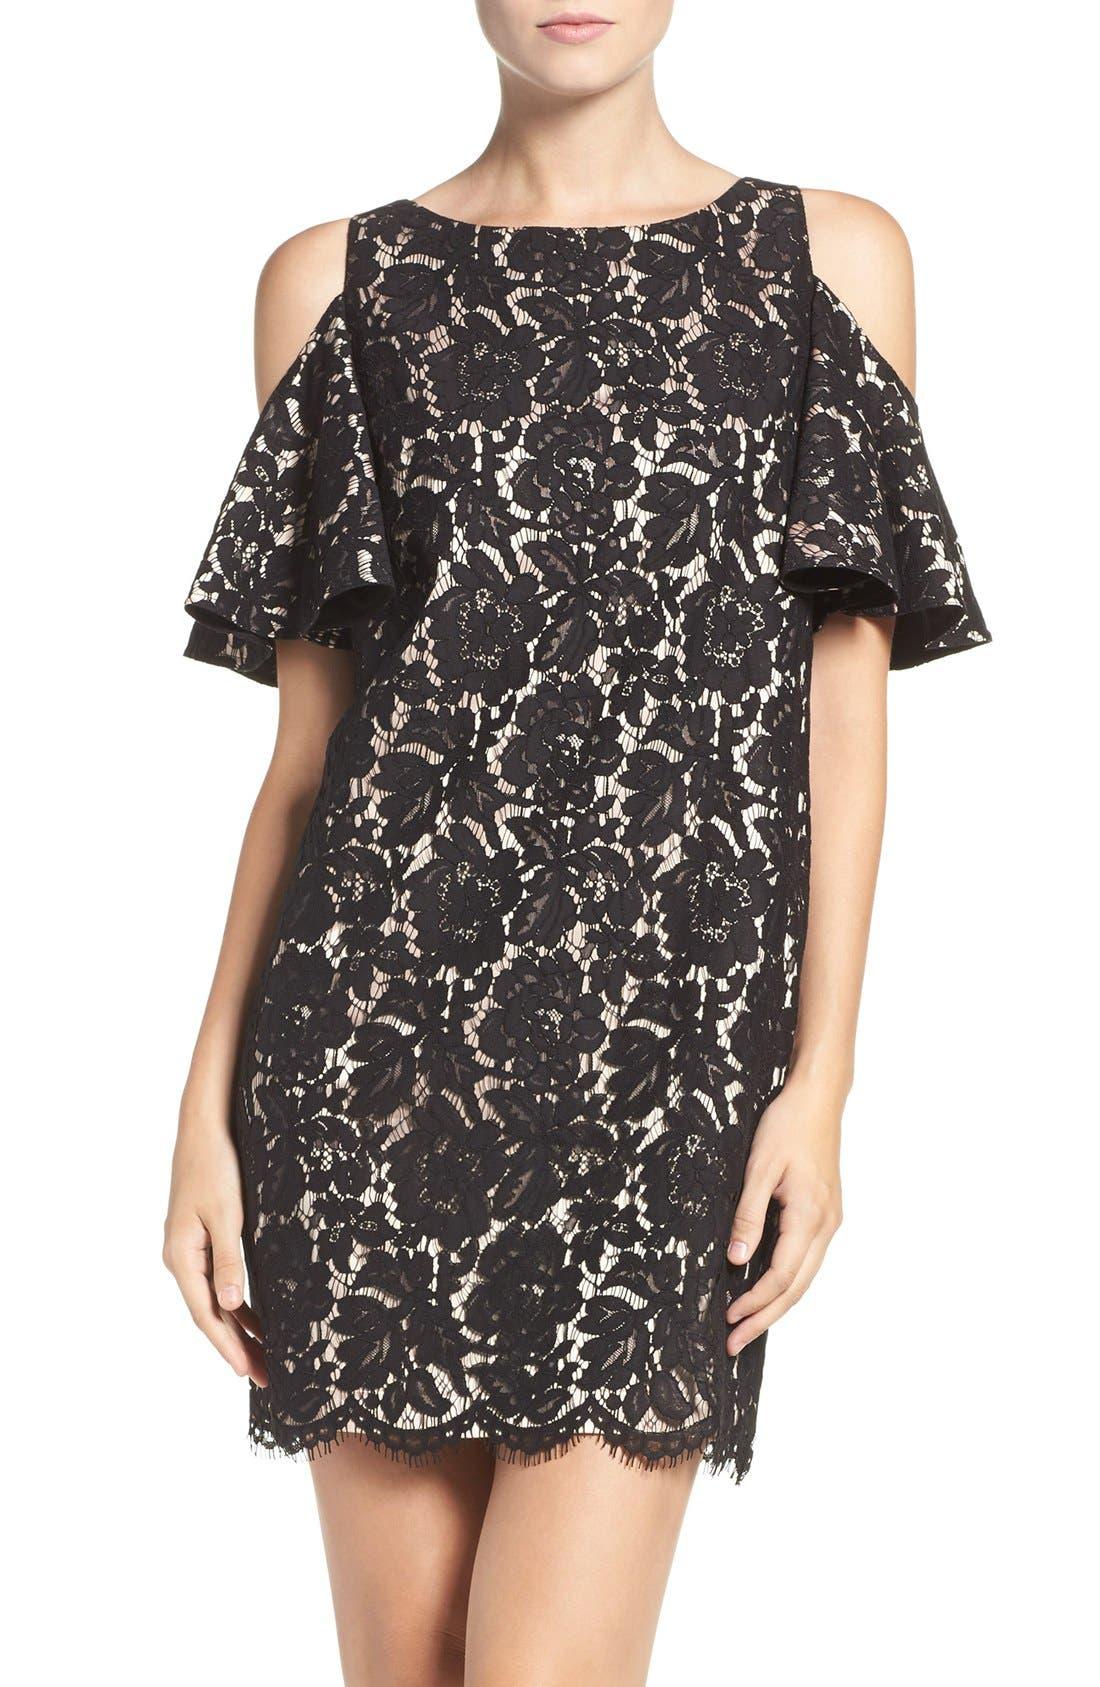 Main Image - Chelsea28 Cold Shoulder Lace Shift Dress